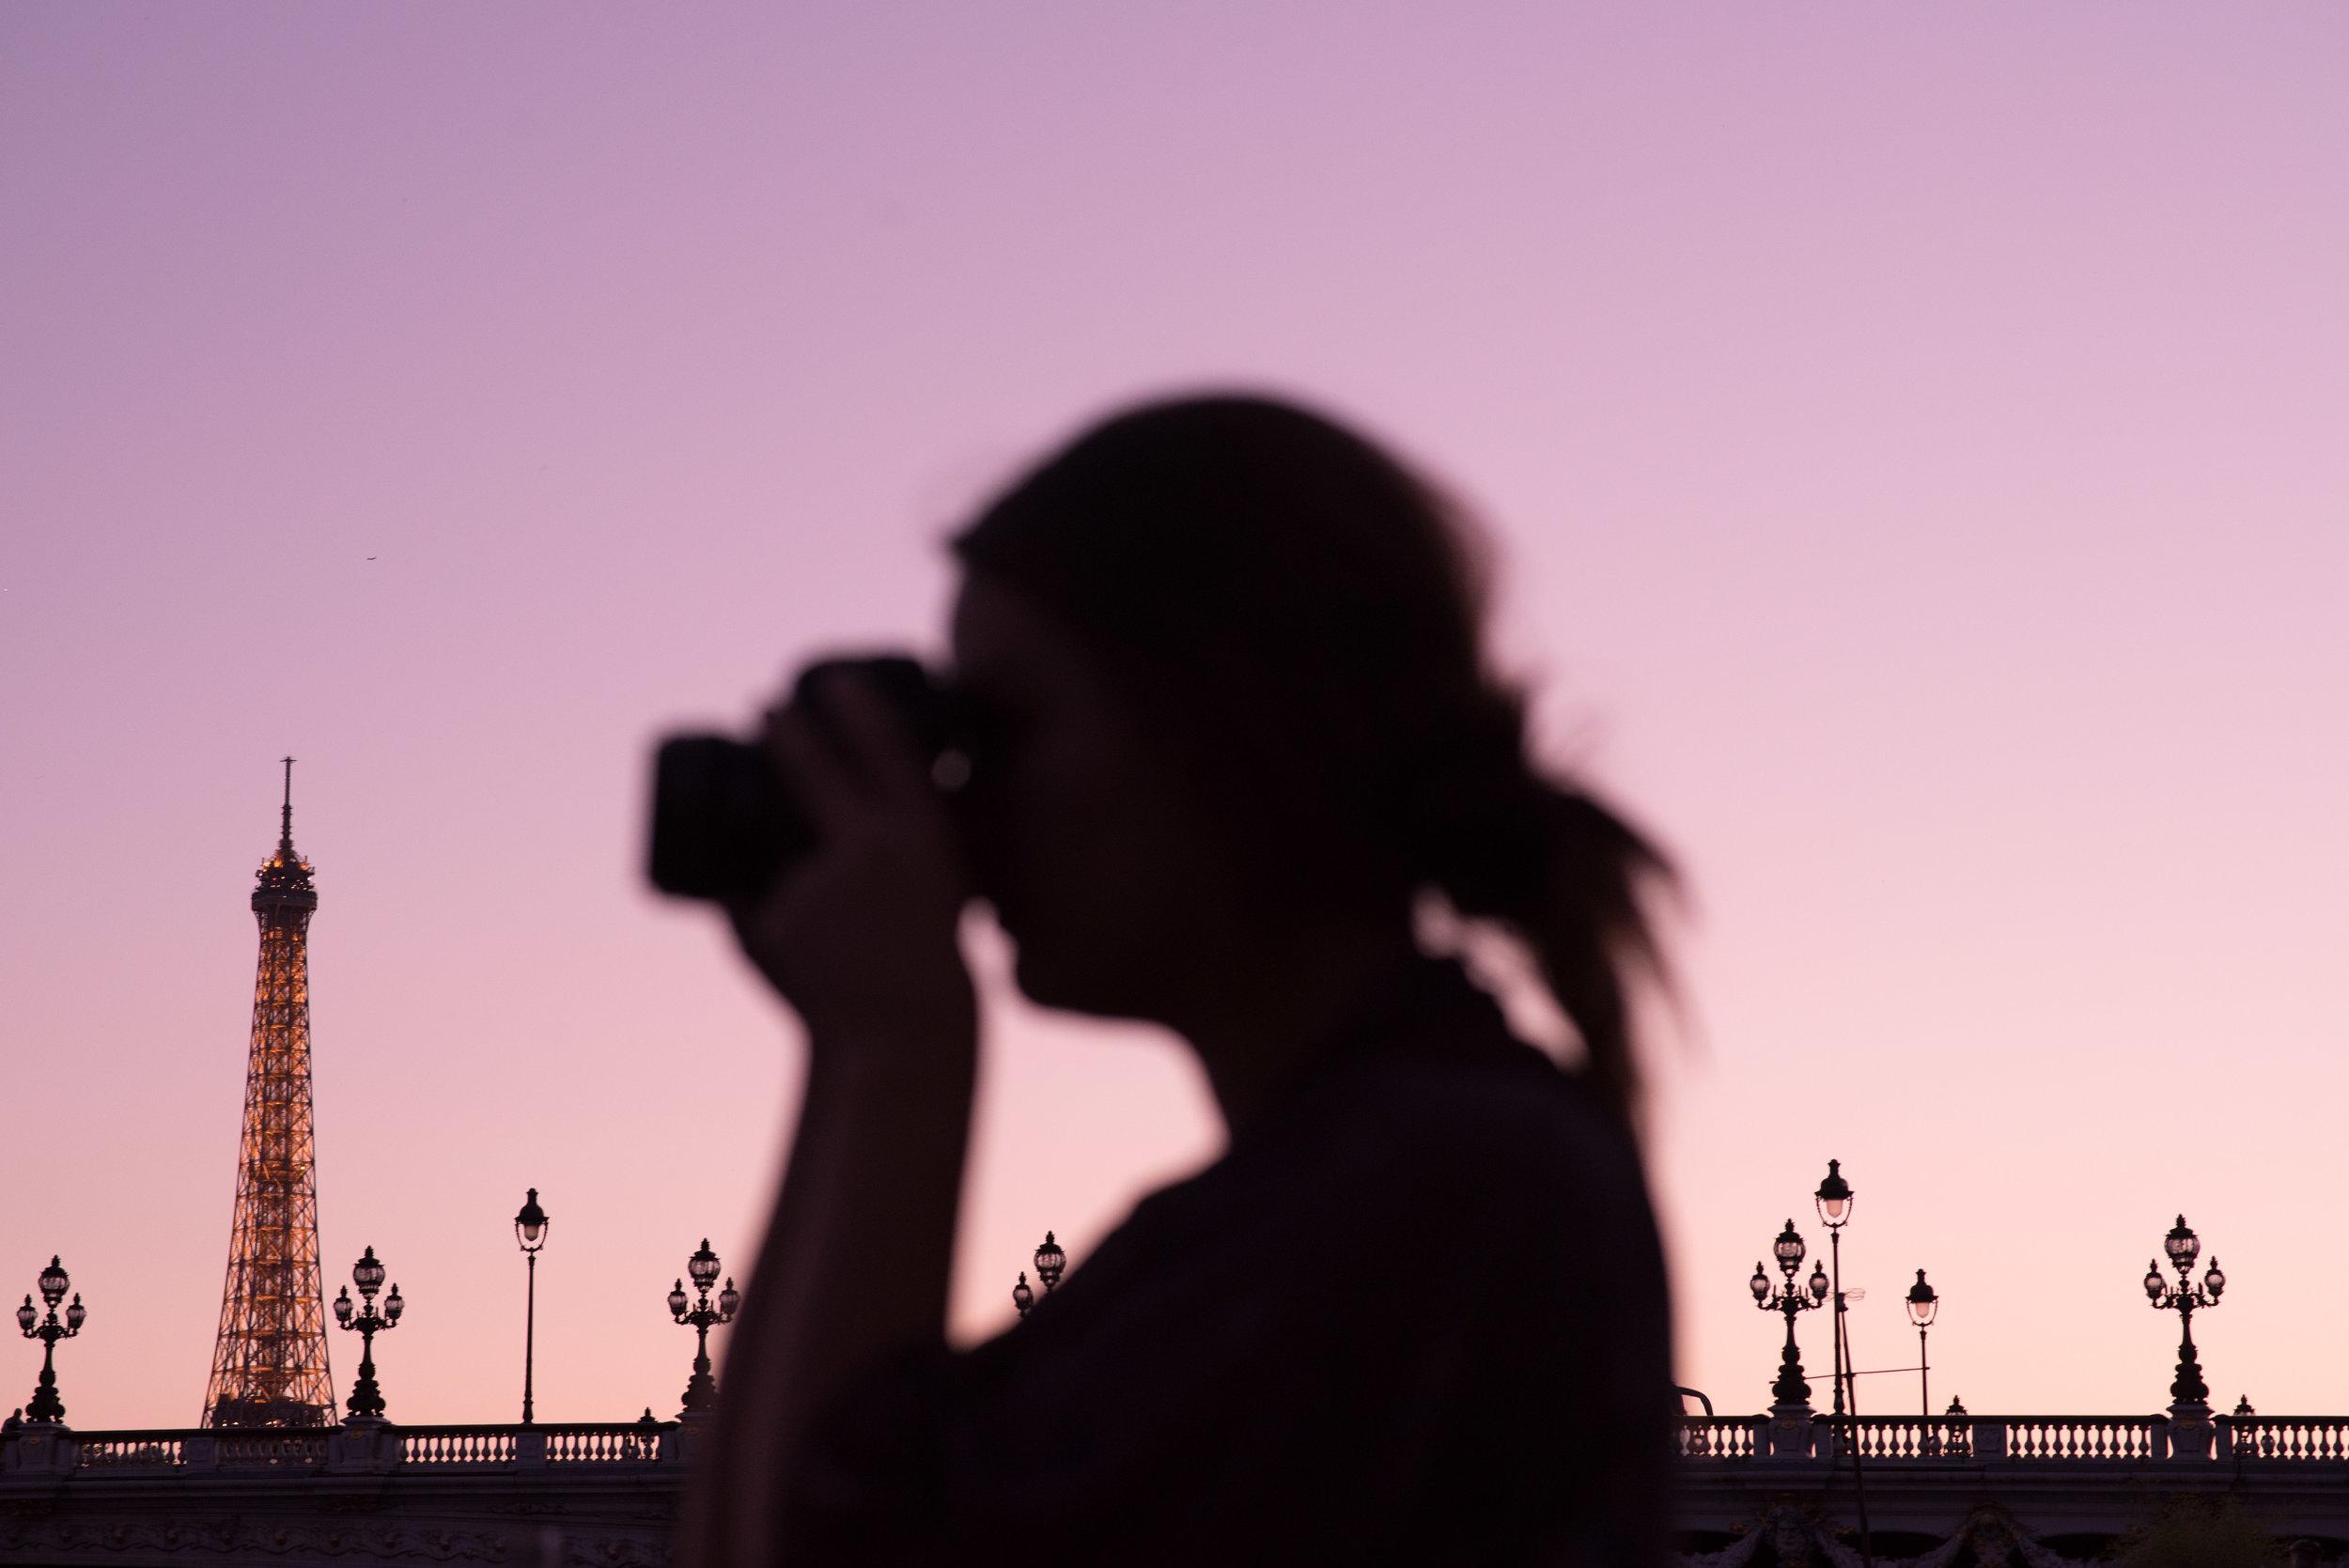 Louve ParisDSC_2198.jpg